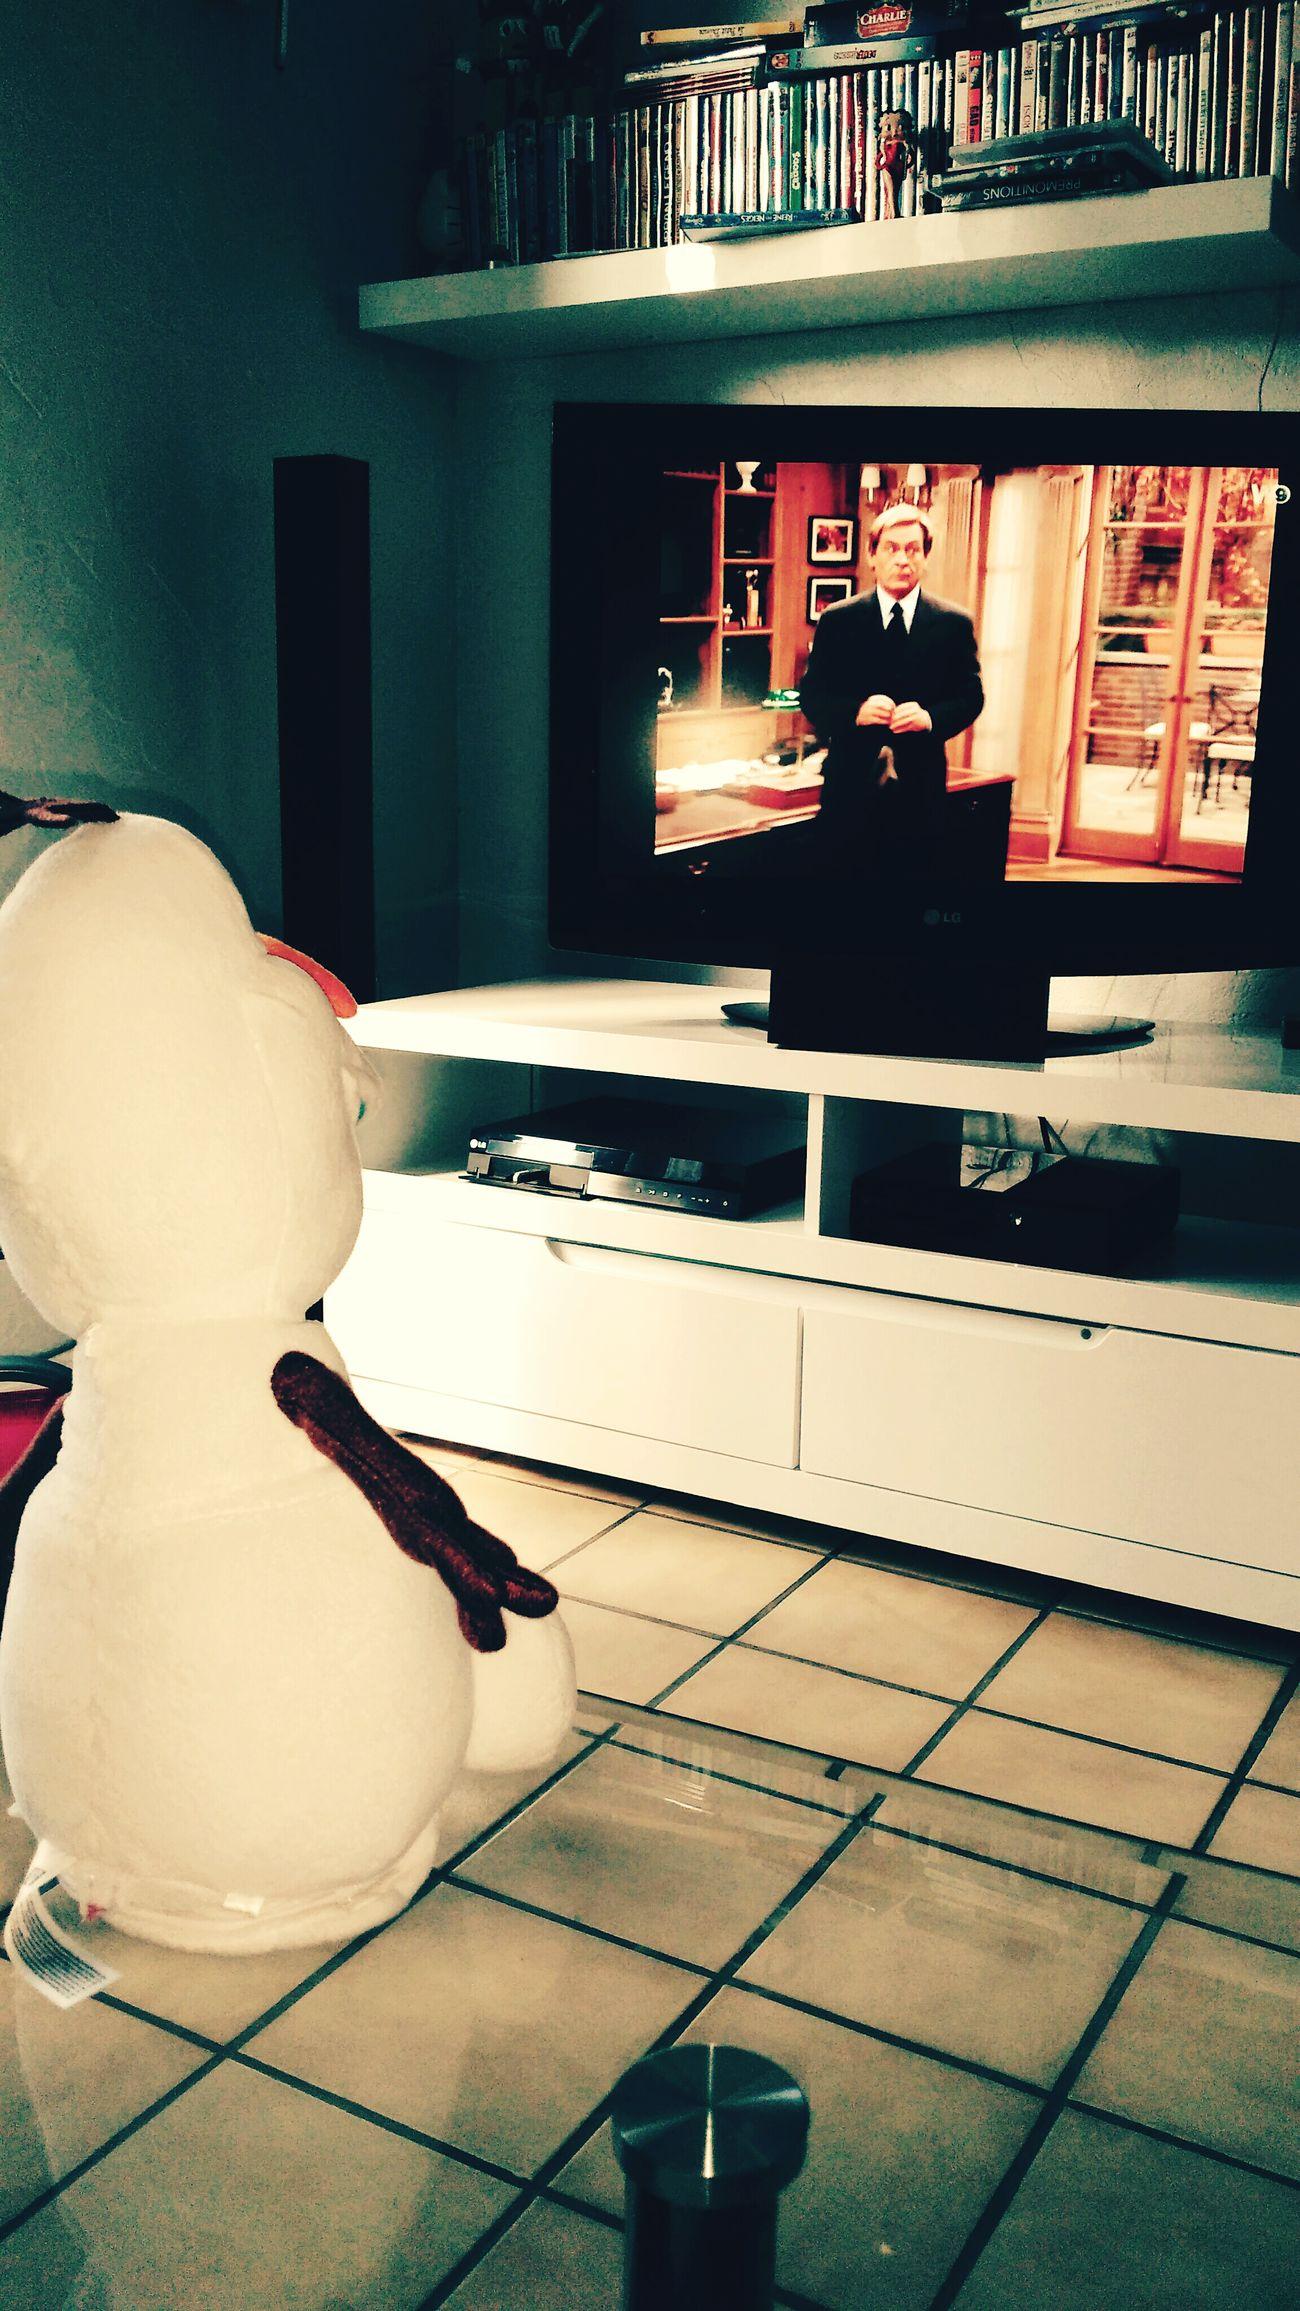 Olaf fond devant Niels Tv Television Fun Have Fun Delire OpenEdit Toy il faut garder son ame d enfant 😆 Watching Tv Happy